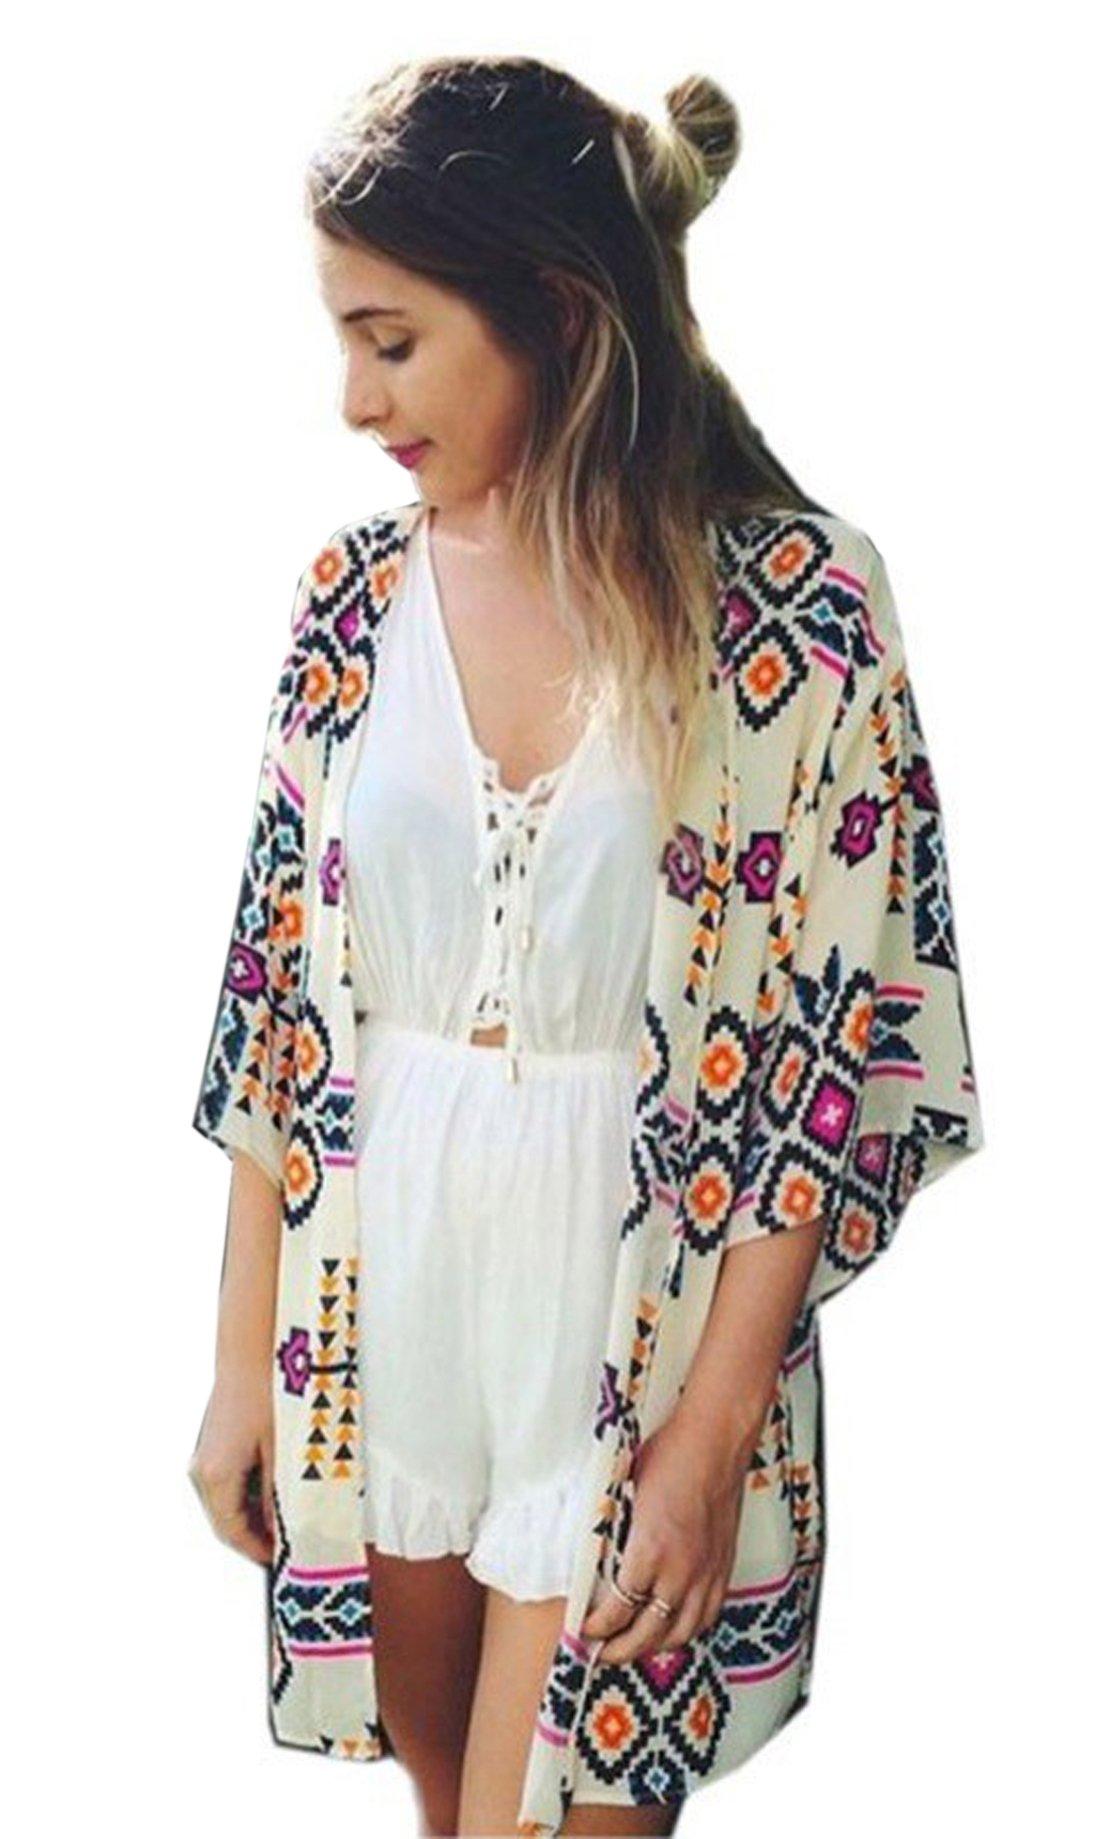 Relipop Women's Sheer Chiffon Blouse Loose Tops Kimono Floral Print Cardigan (Medium, Style 4)